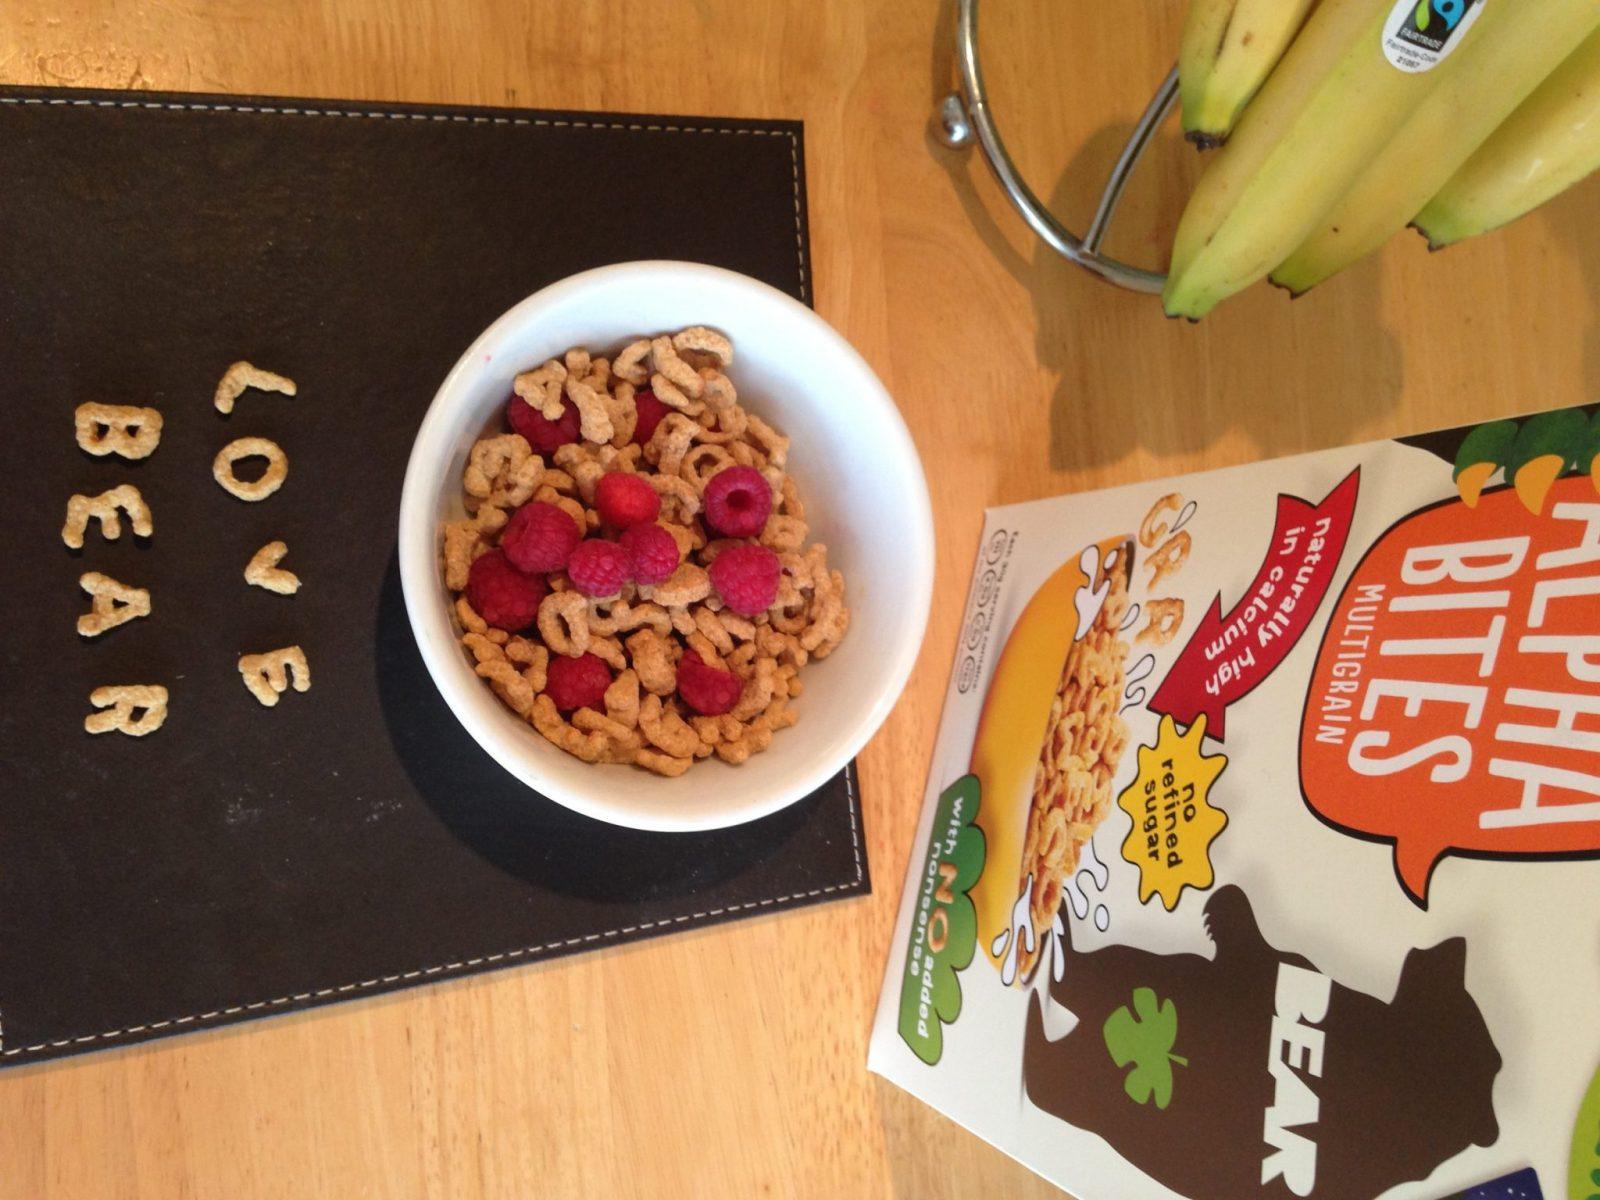 A breakfast kids will love that has no refined sugar